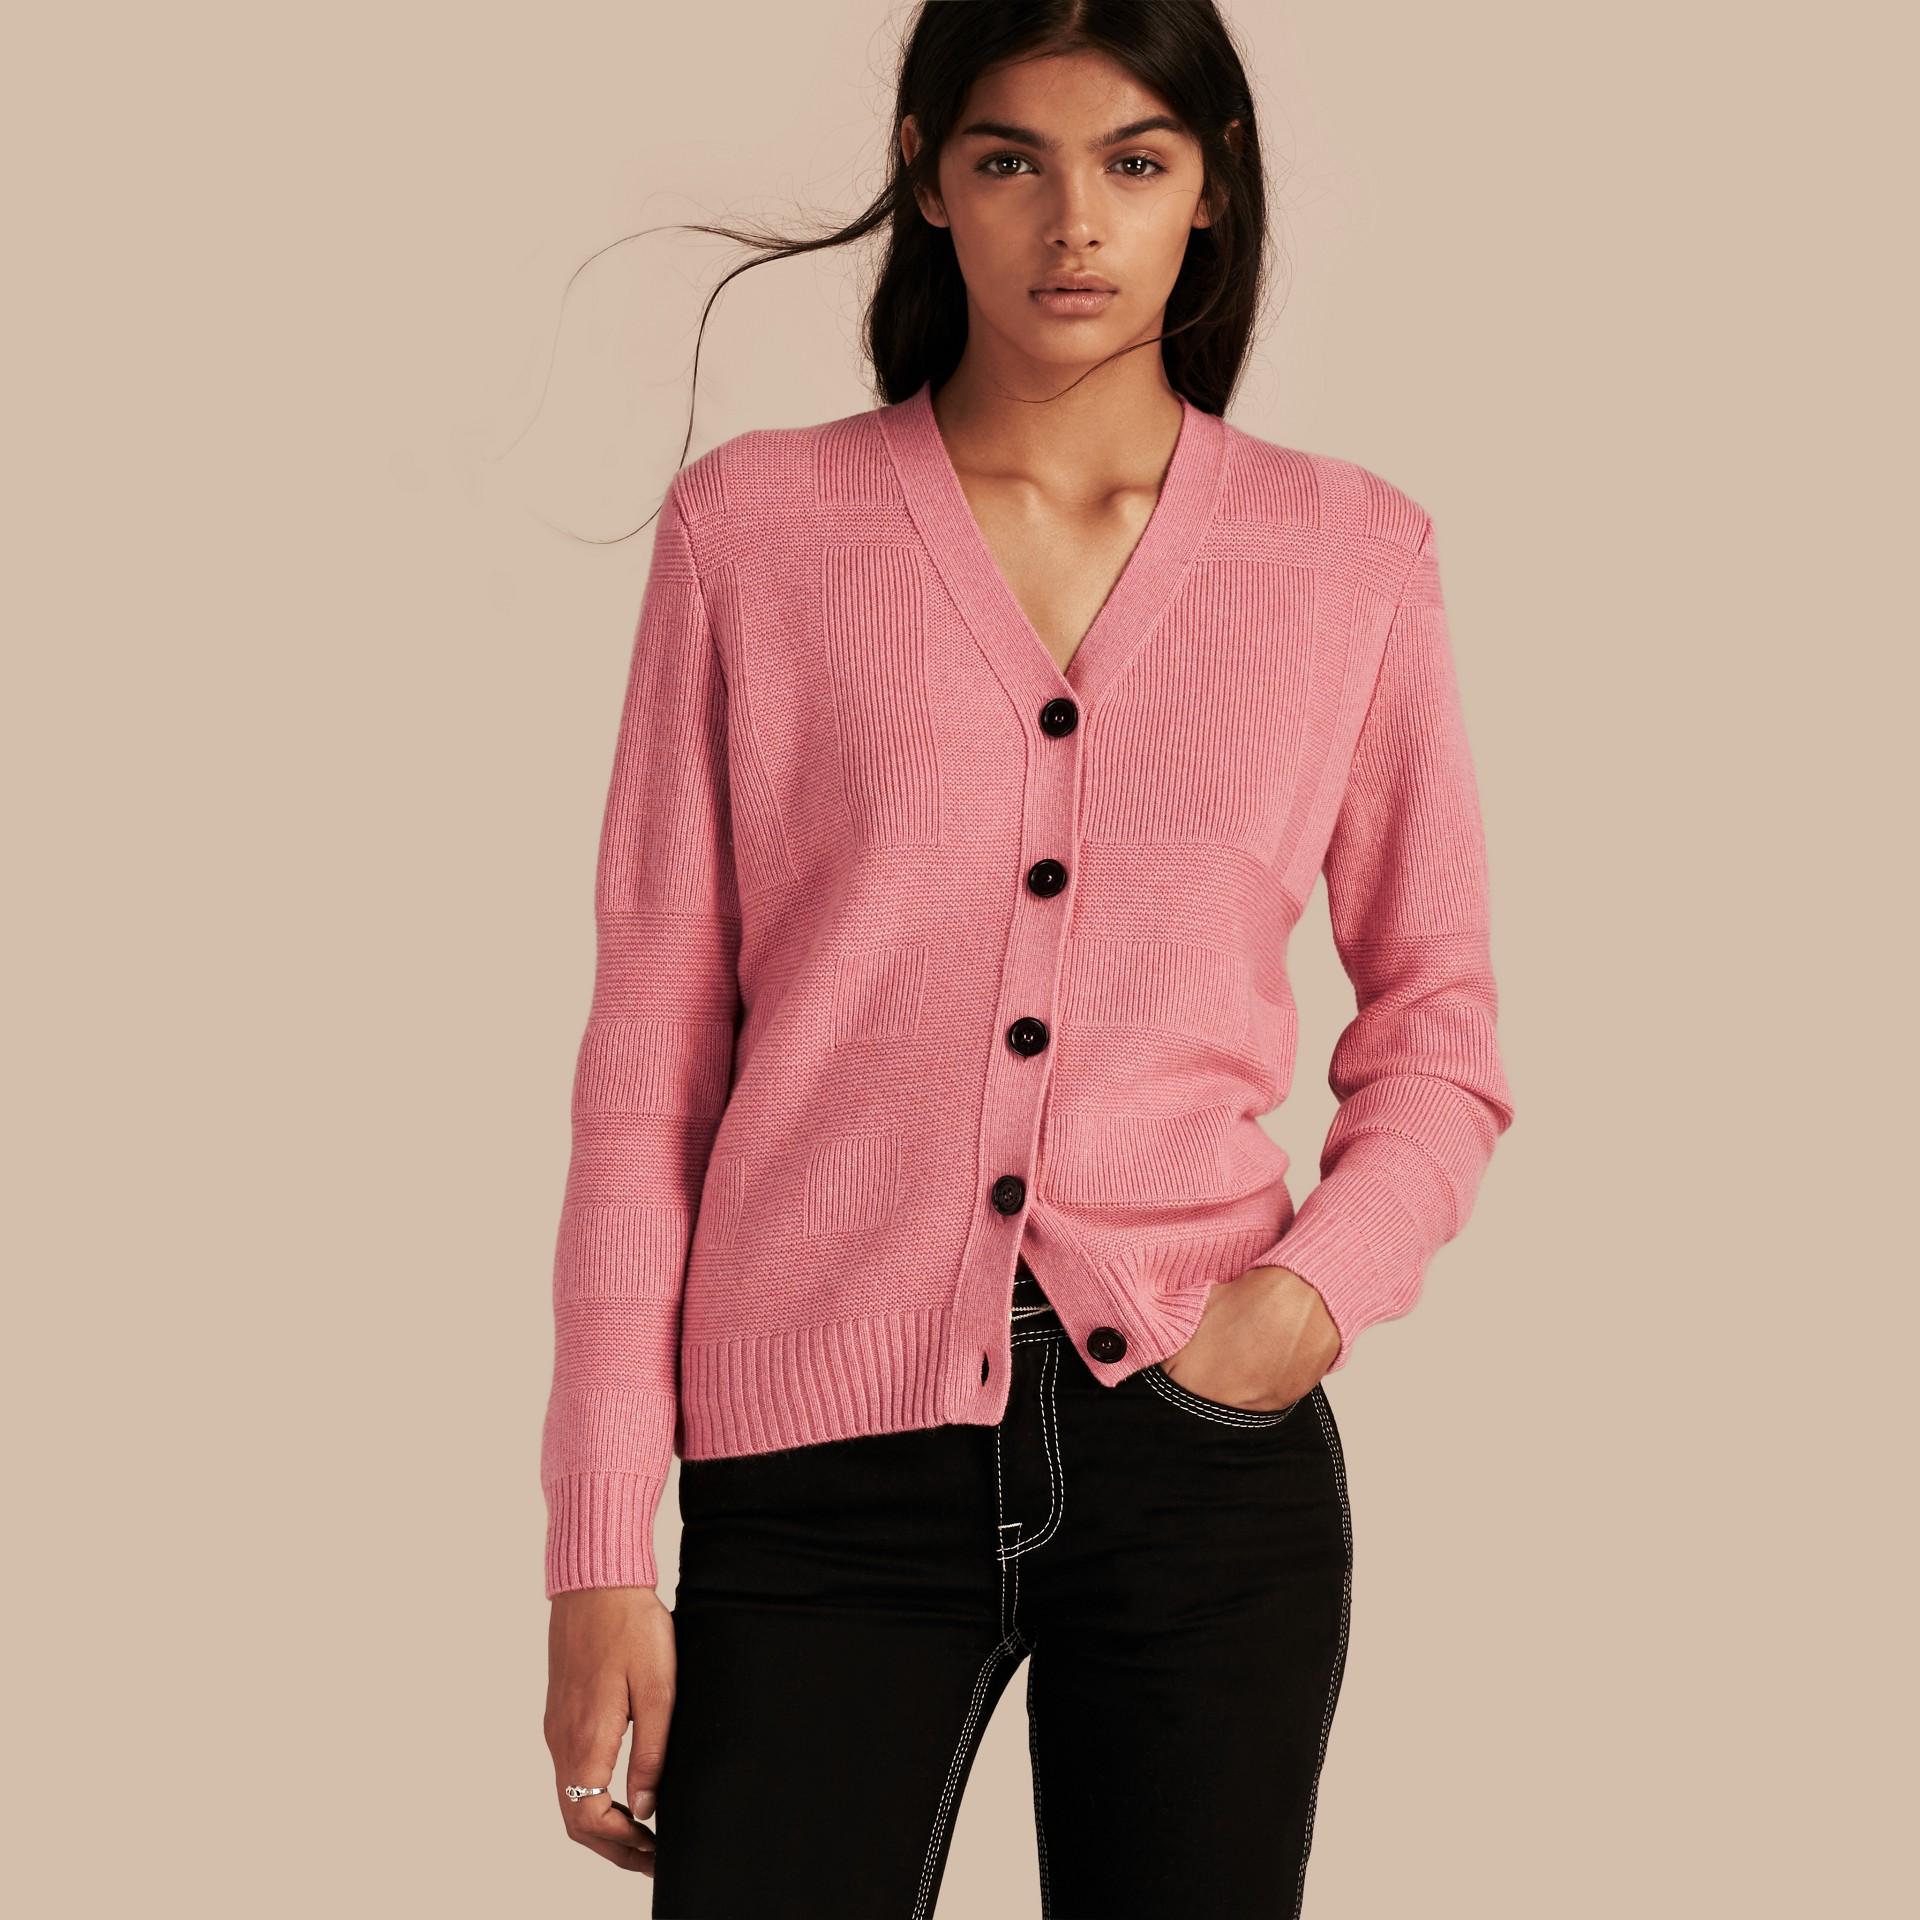 Hydrangea pink melange Check-knit Wool Cashmere Cardigan Hydrangea Pink Melange - gallery image 1